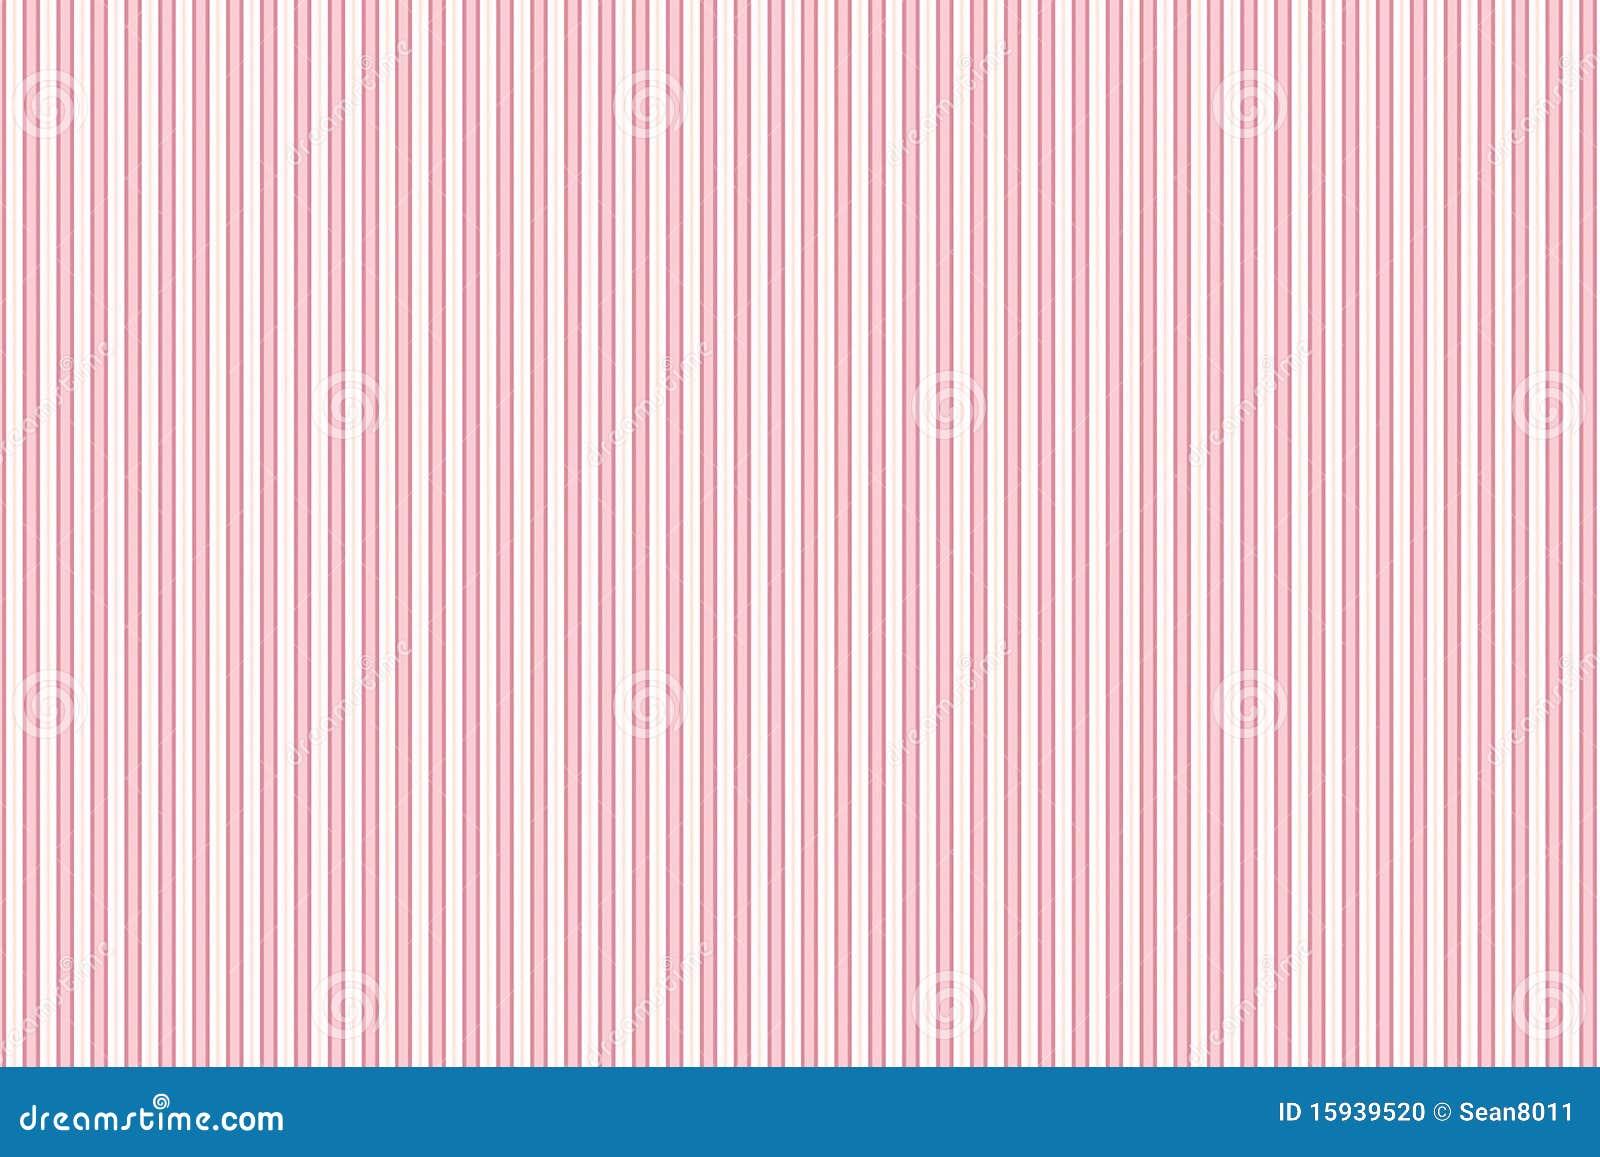 Righe a strisce carta da parati illustrazione di stock for Carta da parati a righe prezzi